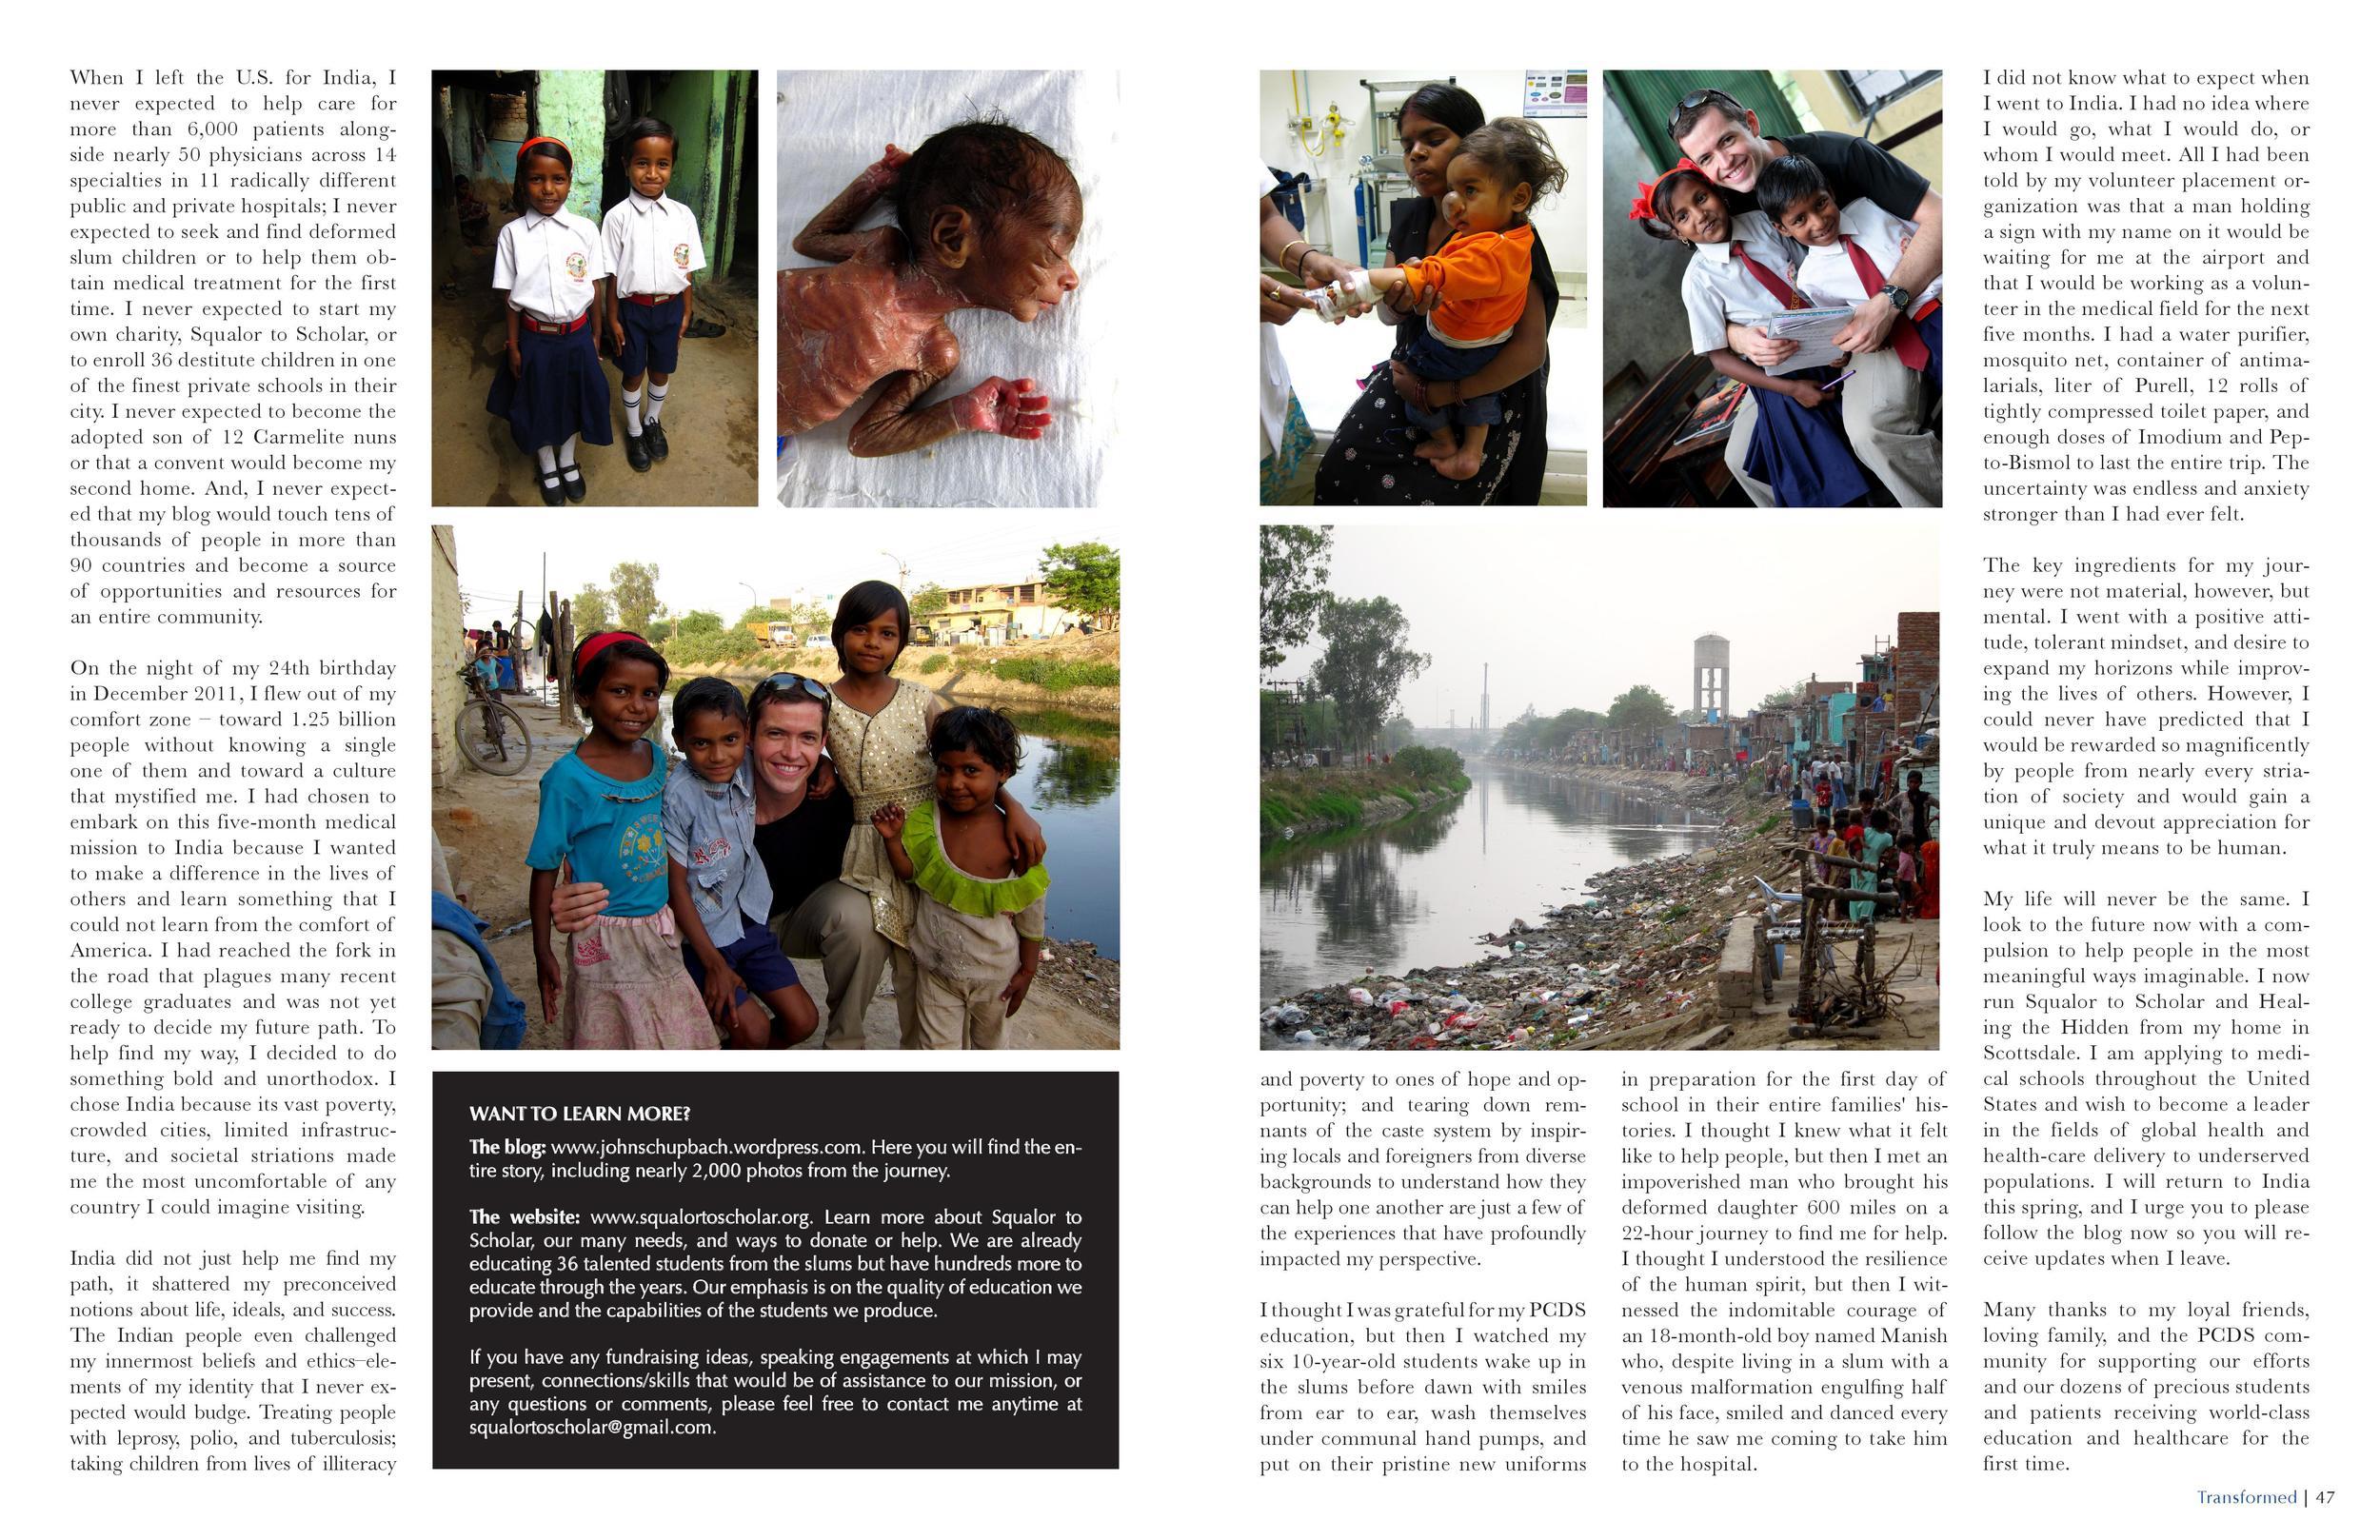 PCDS Article - The Bridge 2012_000002.jpg